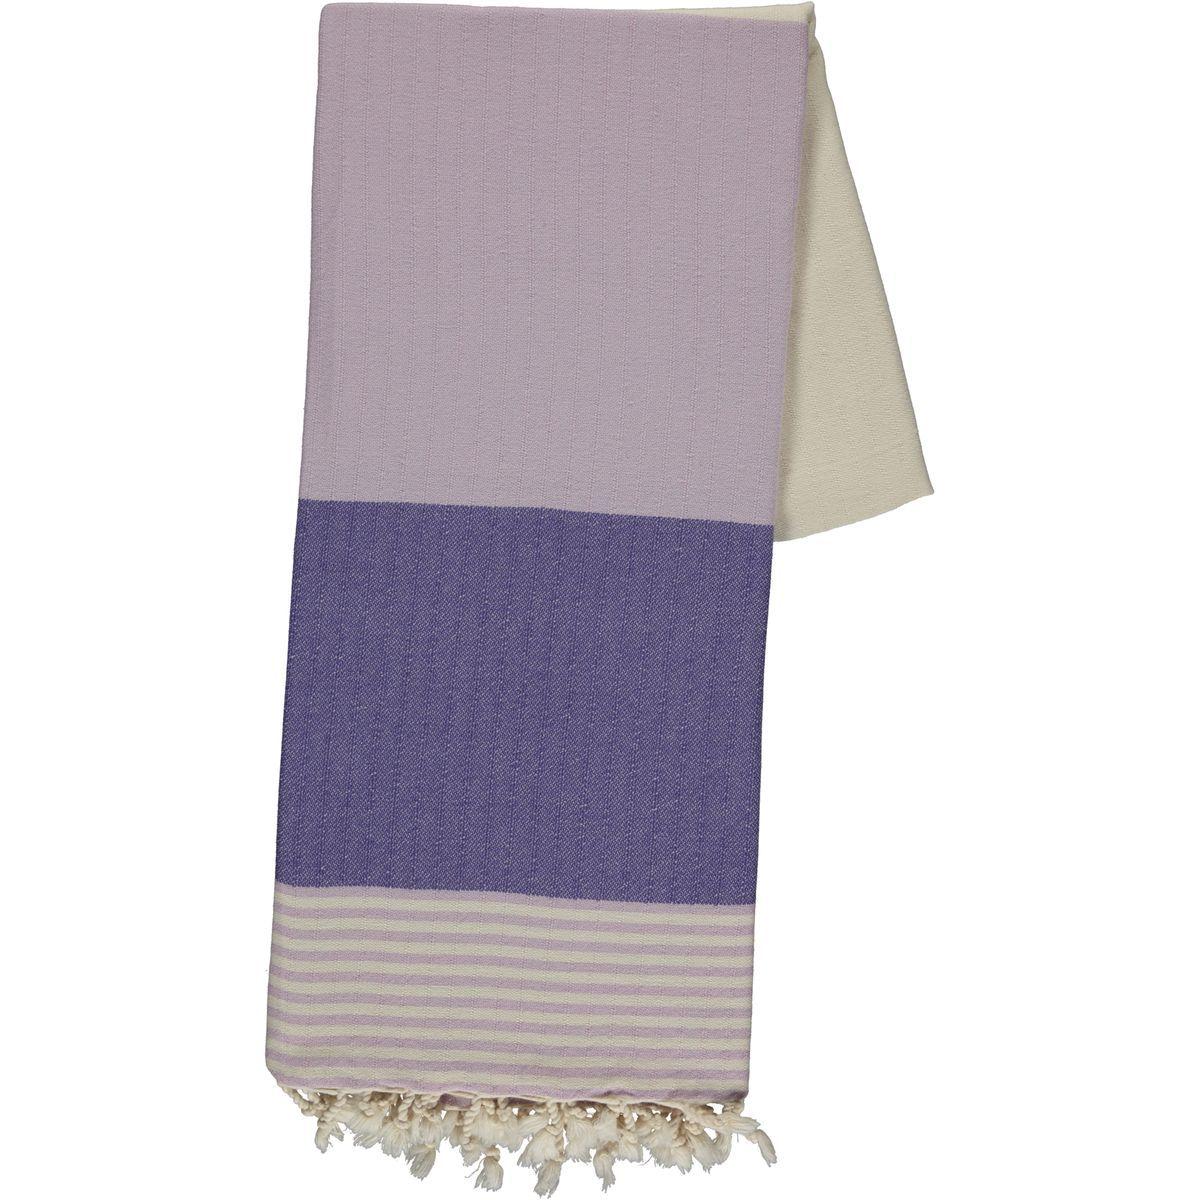 Peshtemal Twin Sultan - Lilac / Violet